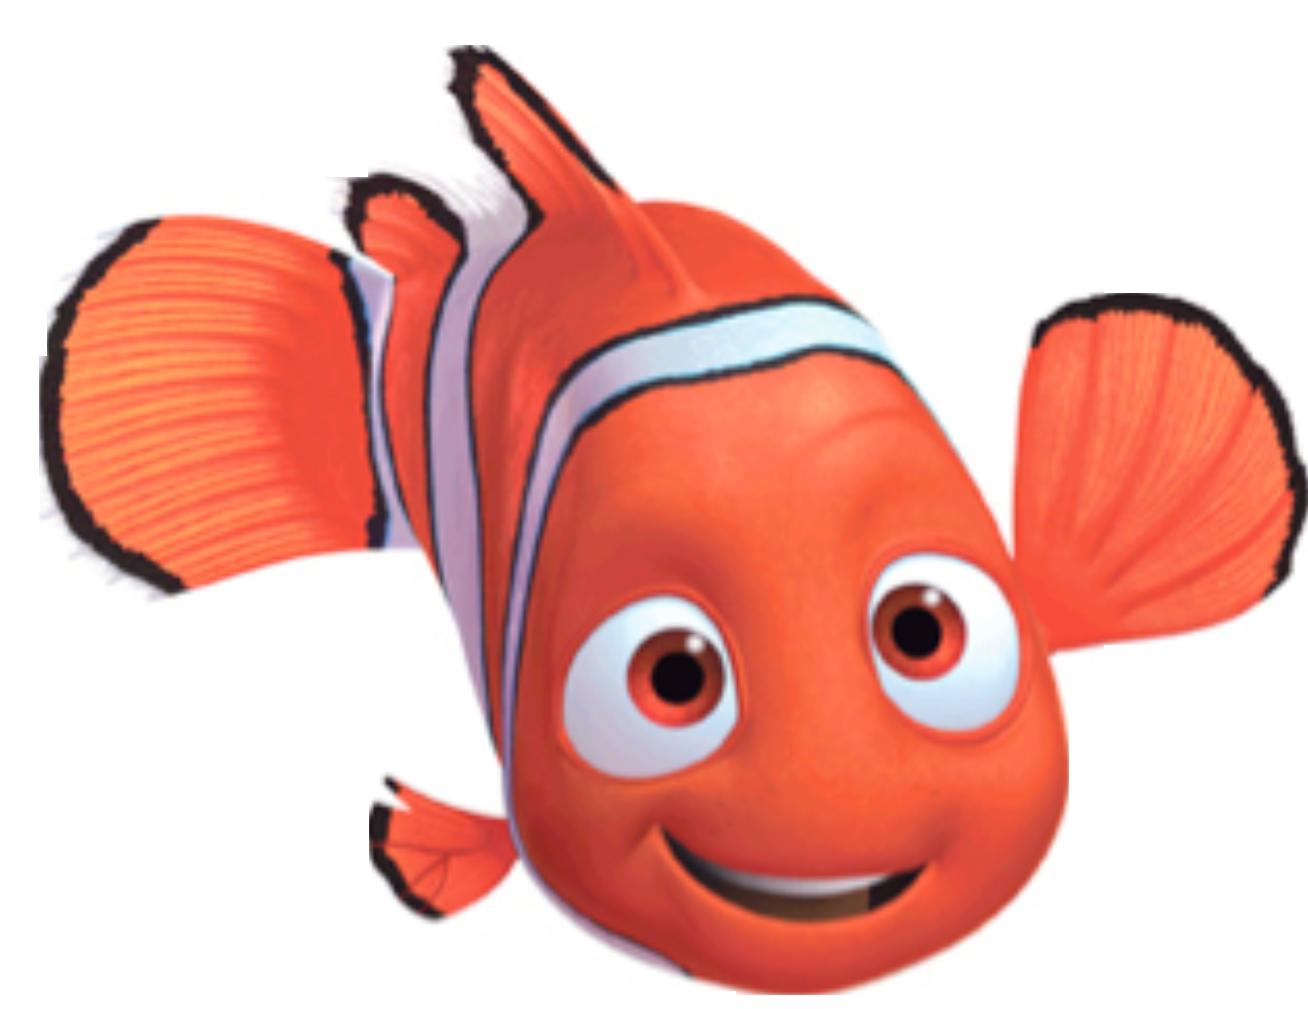 Finding Nemo Clip Art Free, Finding Nemo Free Clipart.